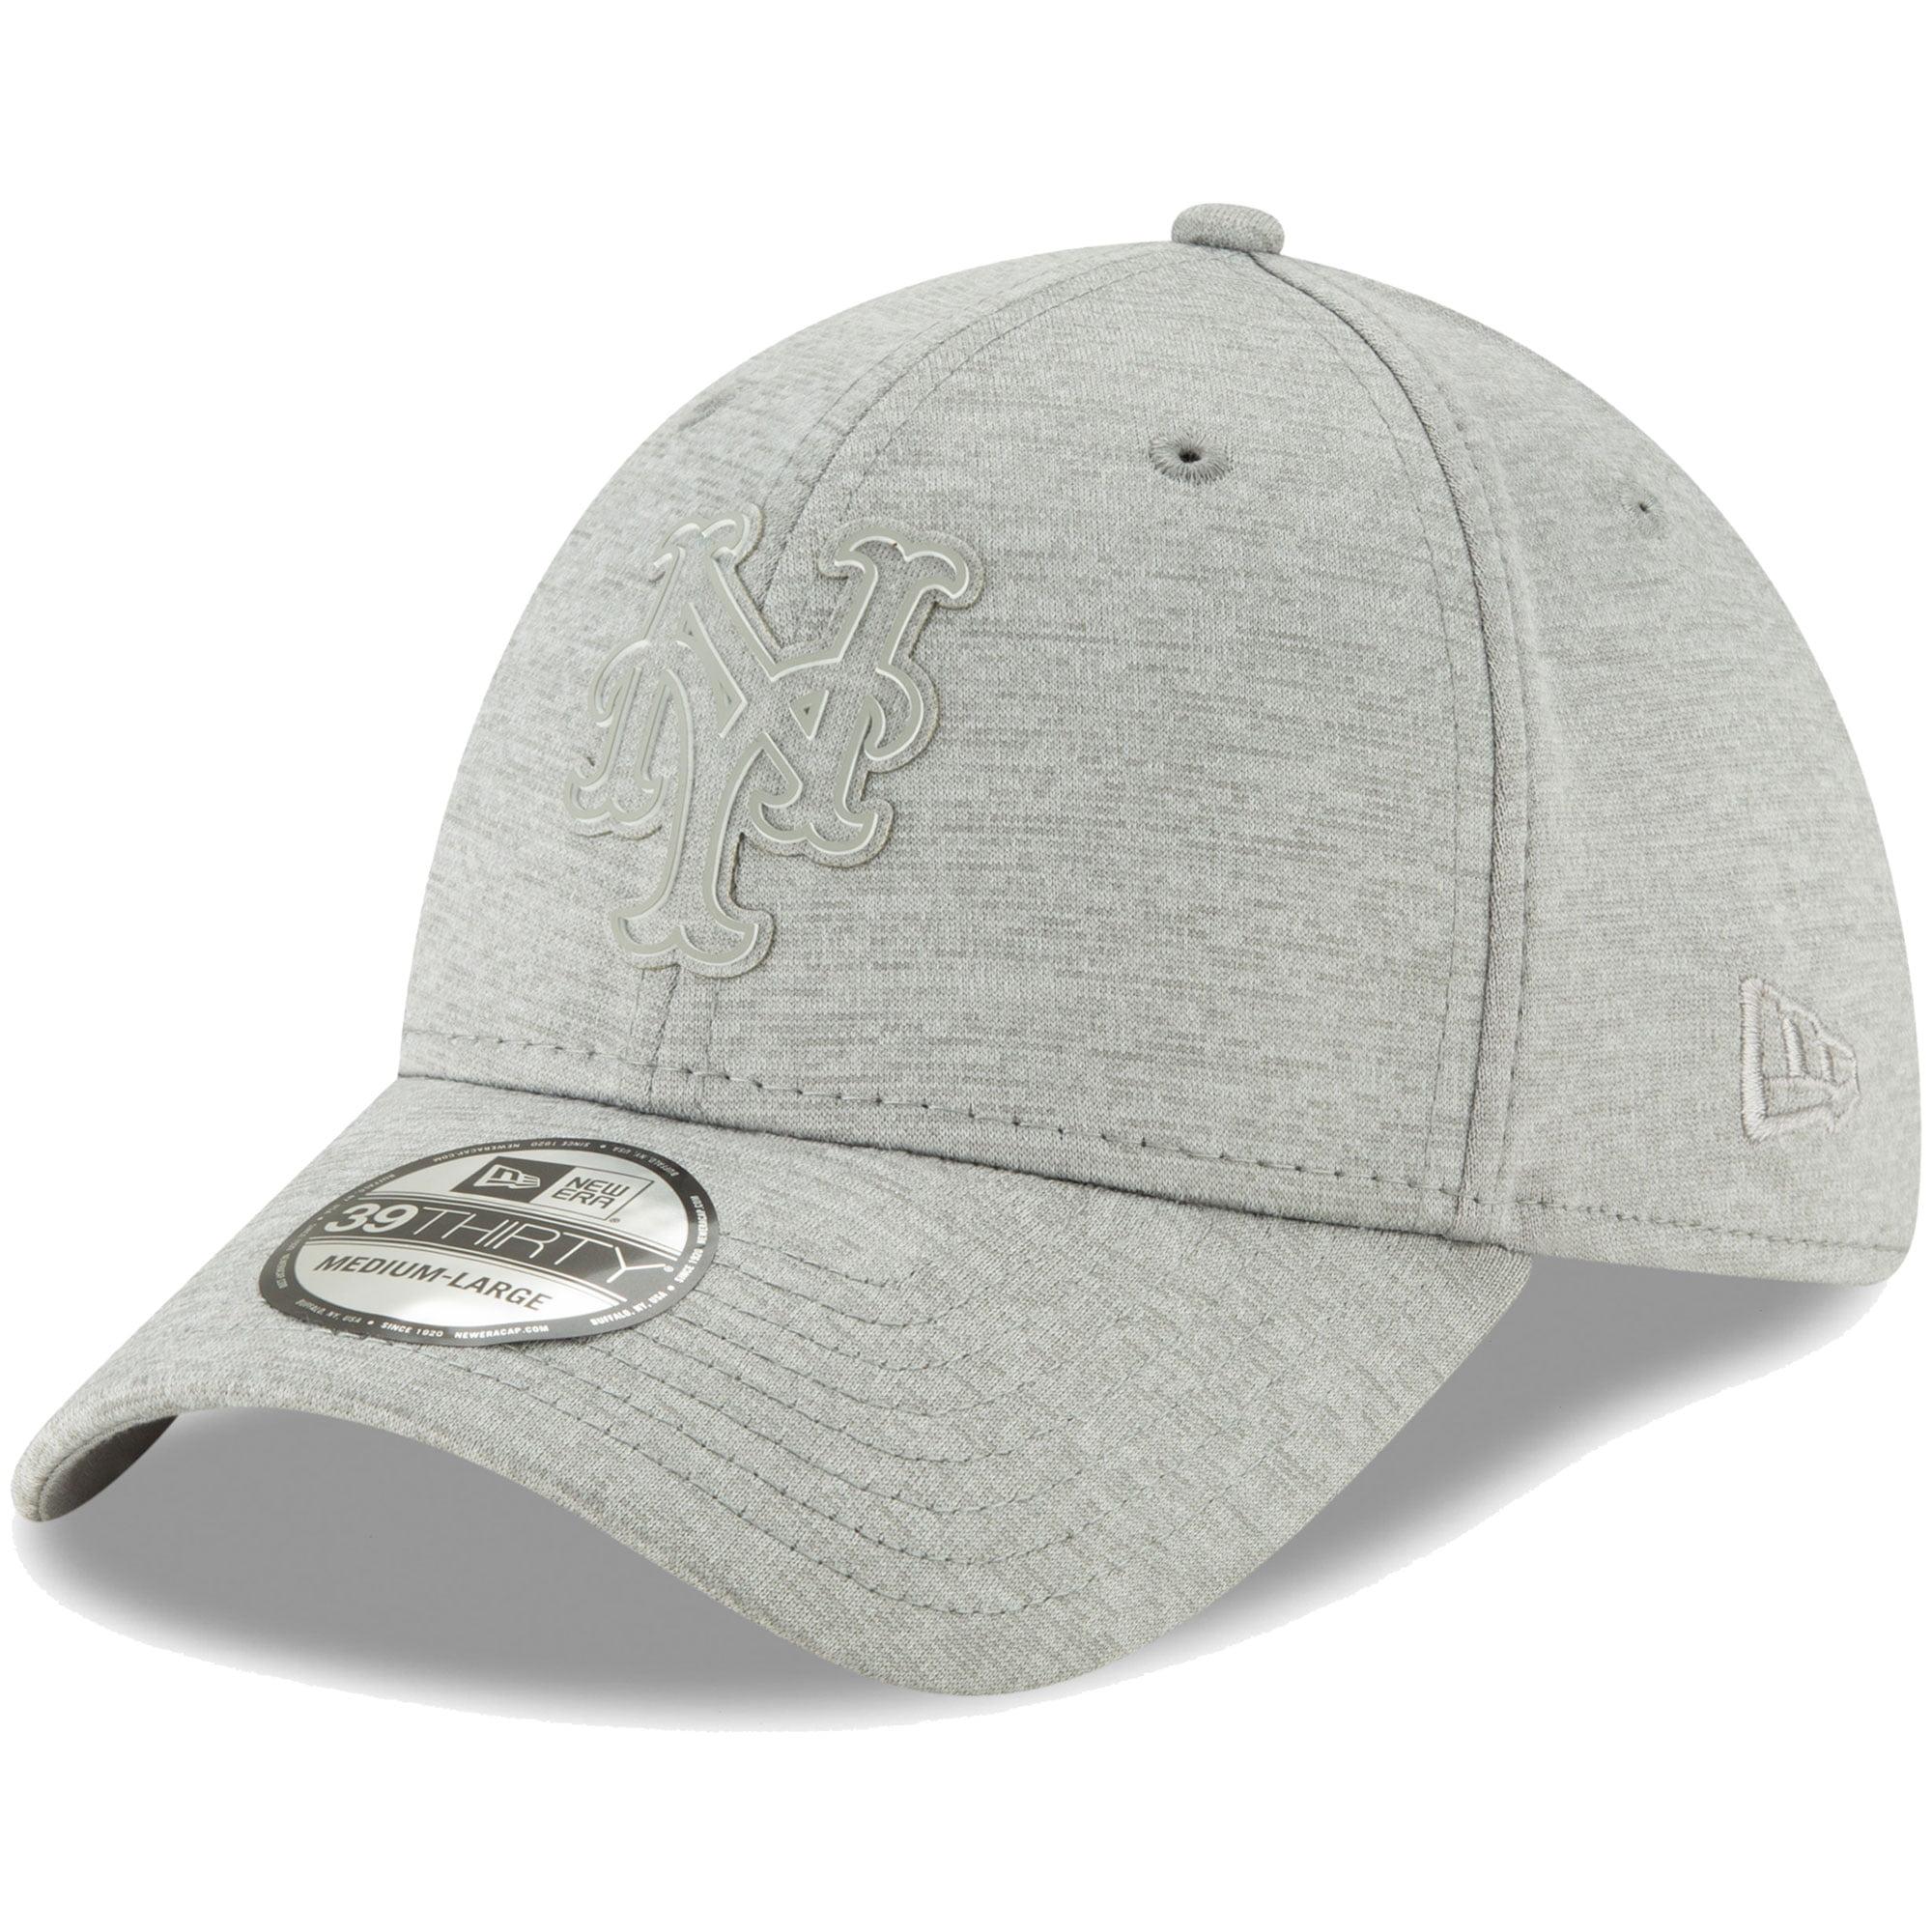 New York Mets New Era Logo Shade 39THIRTY Flex Hat - Gray